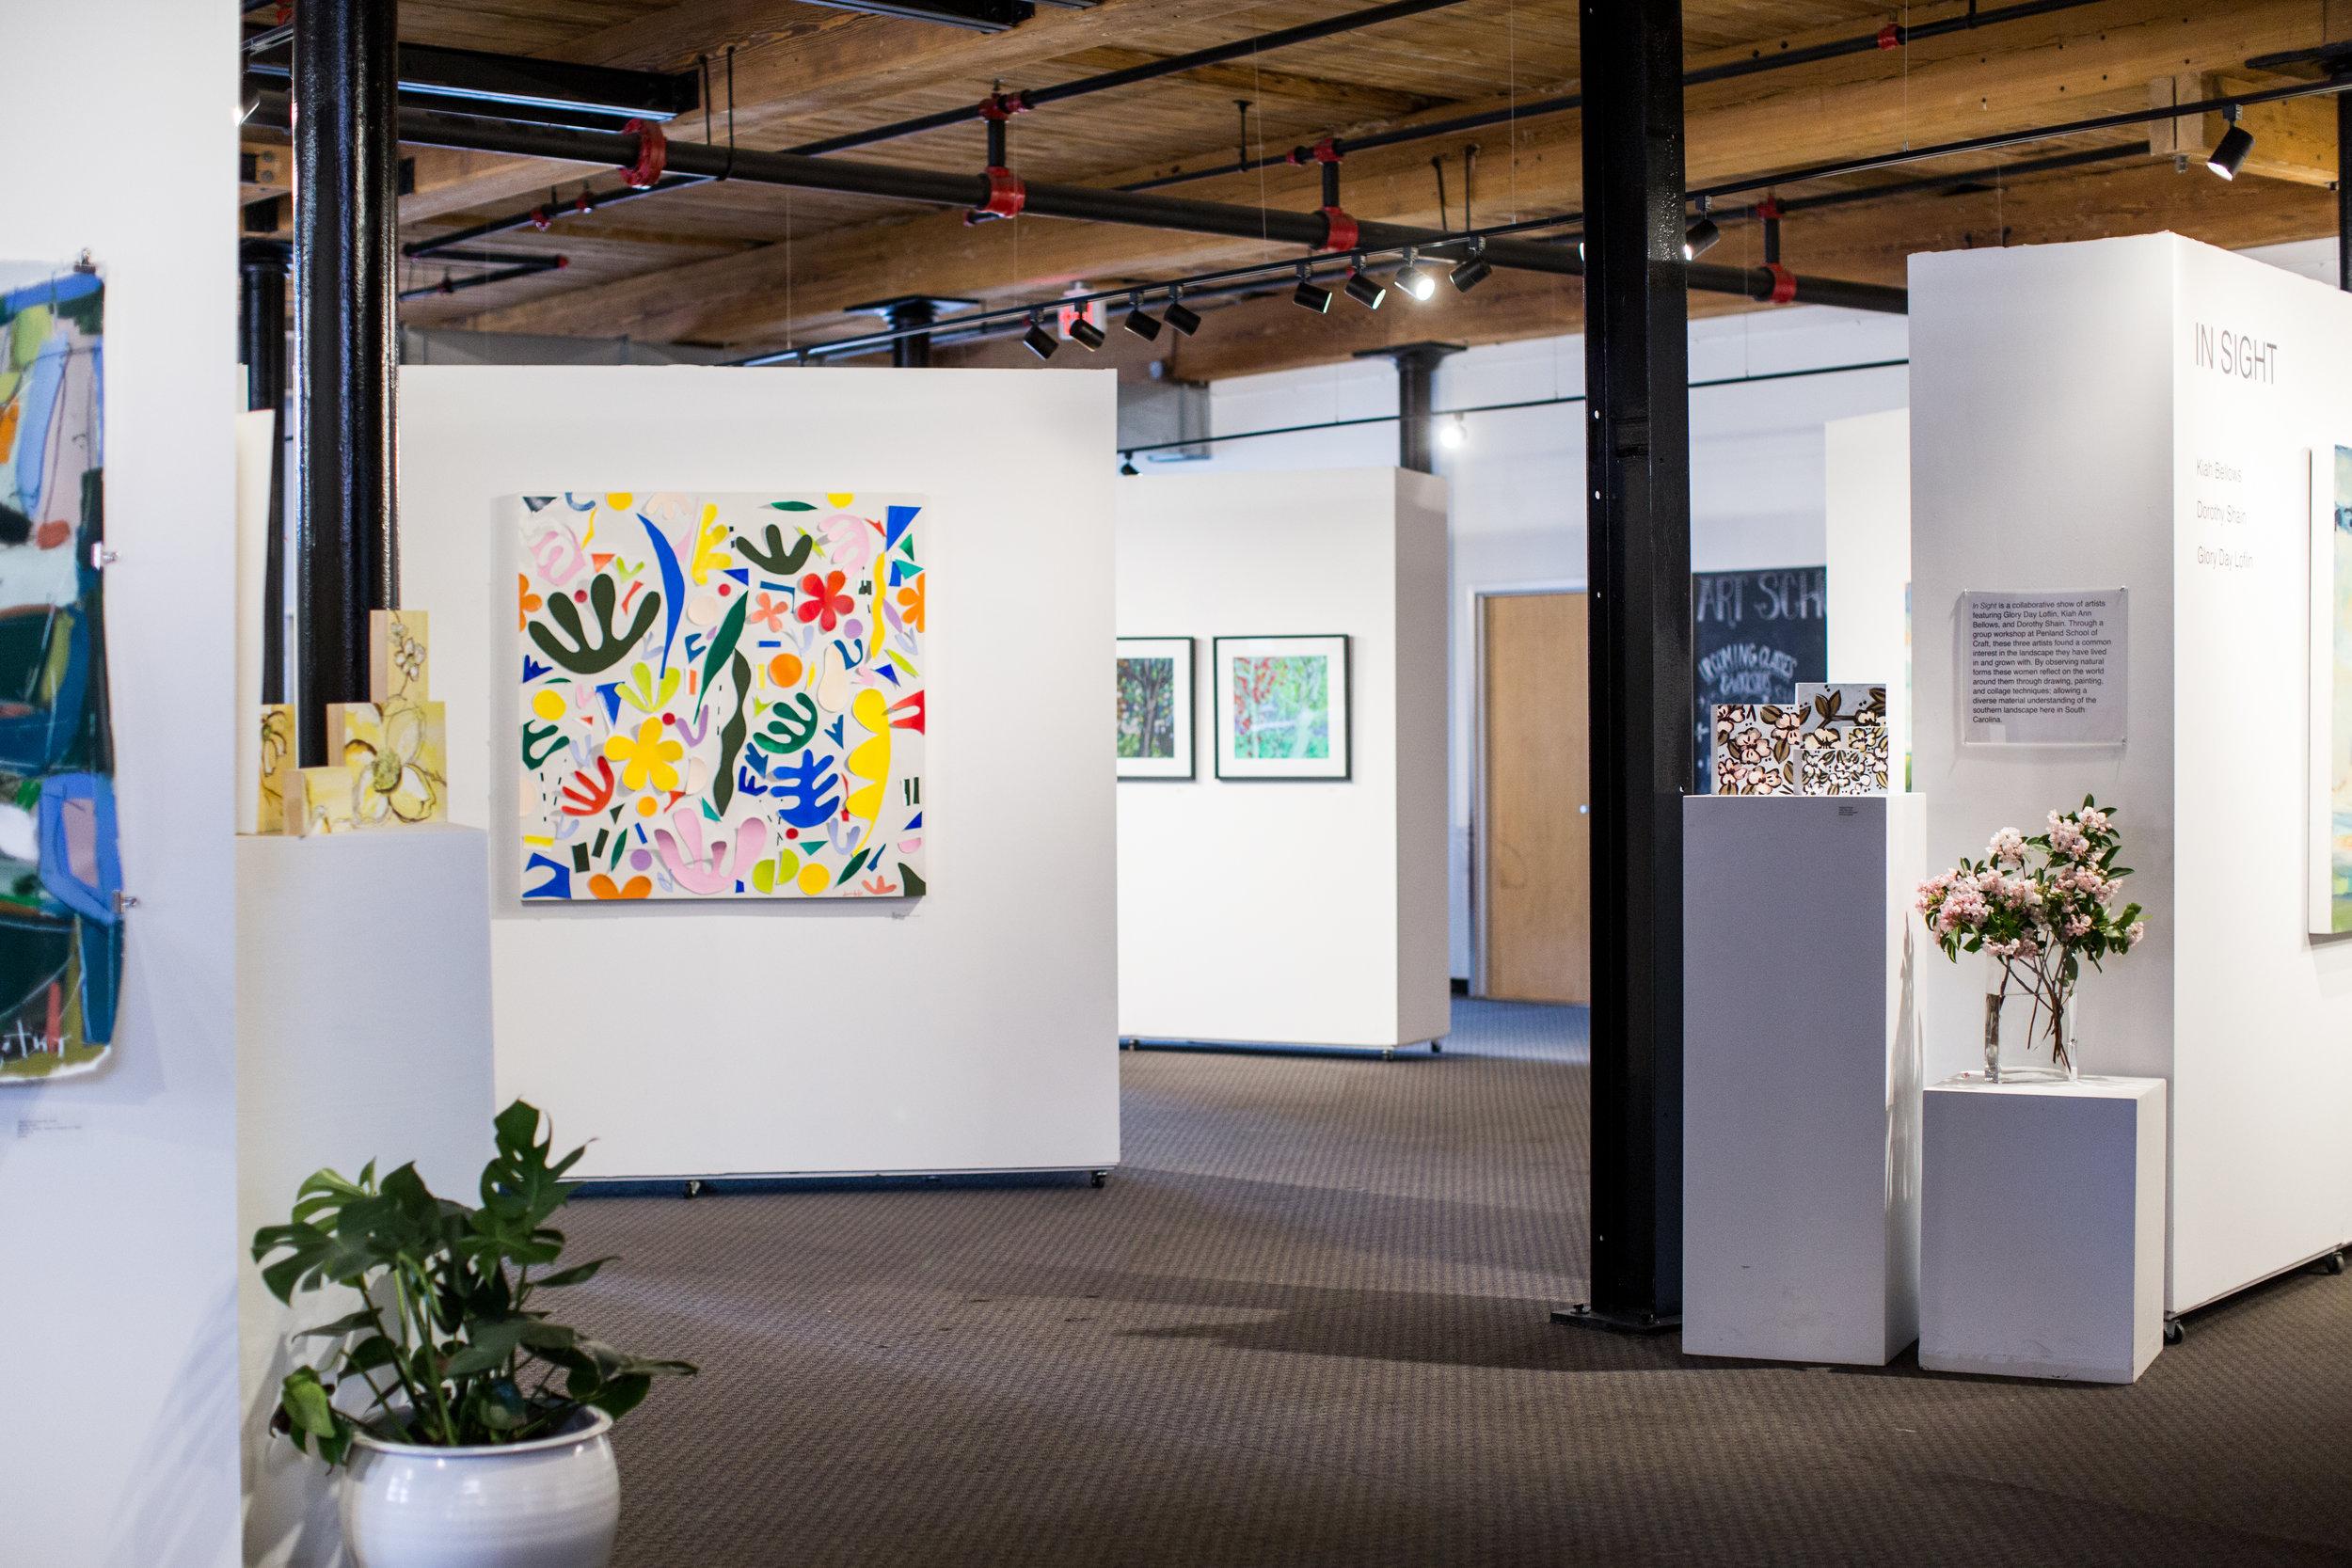 Gallery (art in photo: Dorothy Shain, Glory Day Loflin)